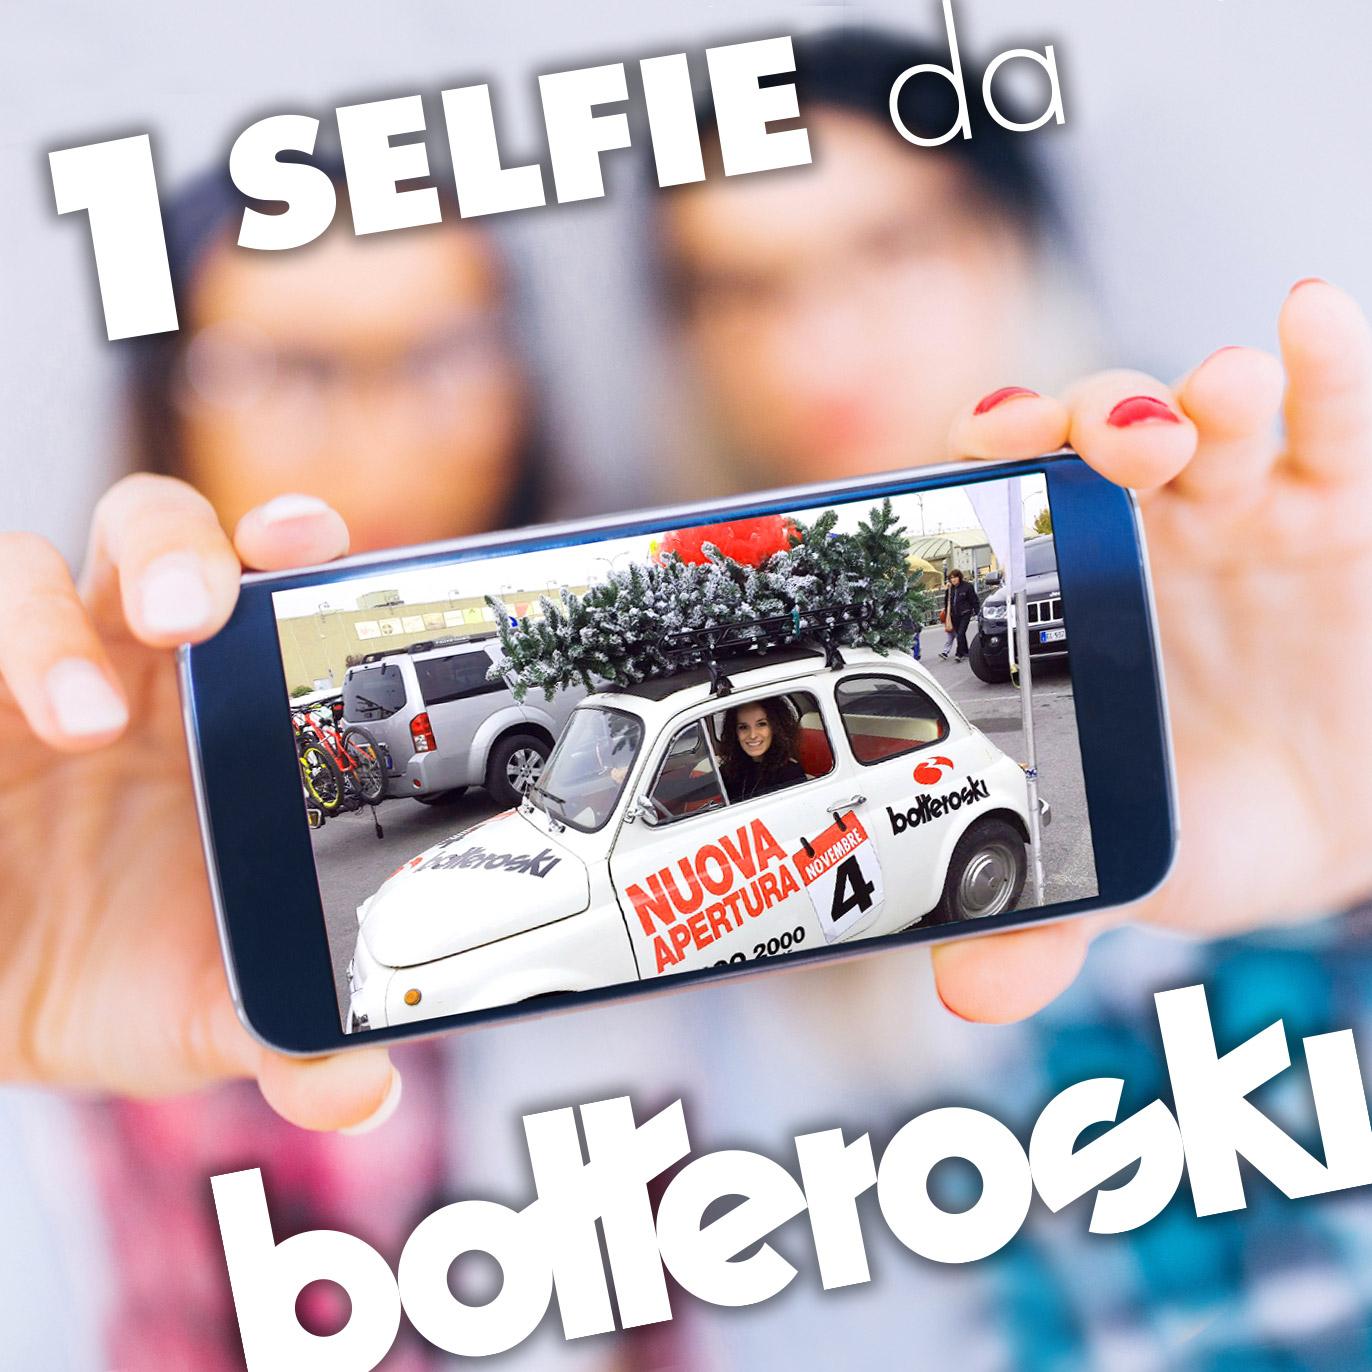 Un selfie da #Botteroski: gioca e vinci al megastore Borgo 2000